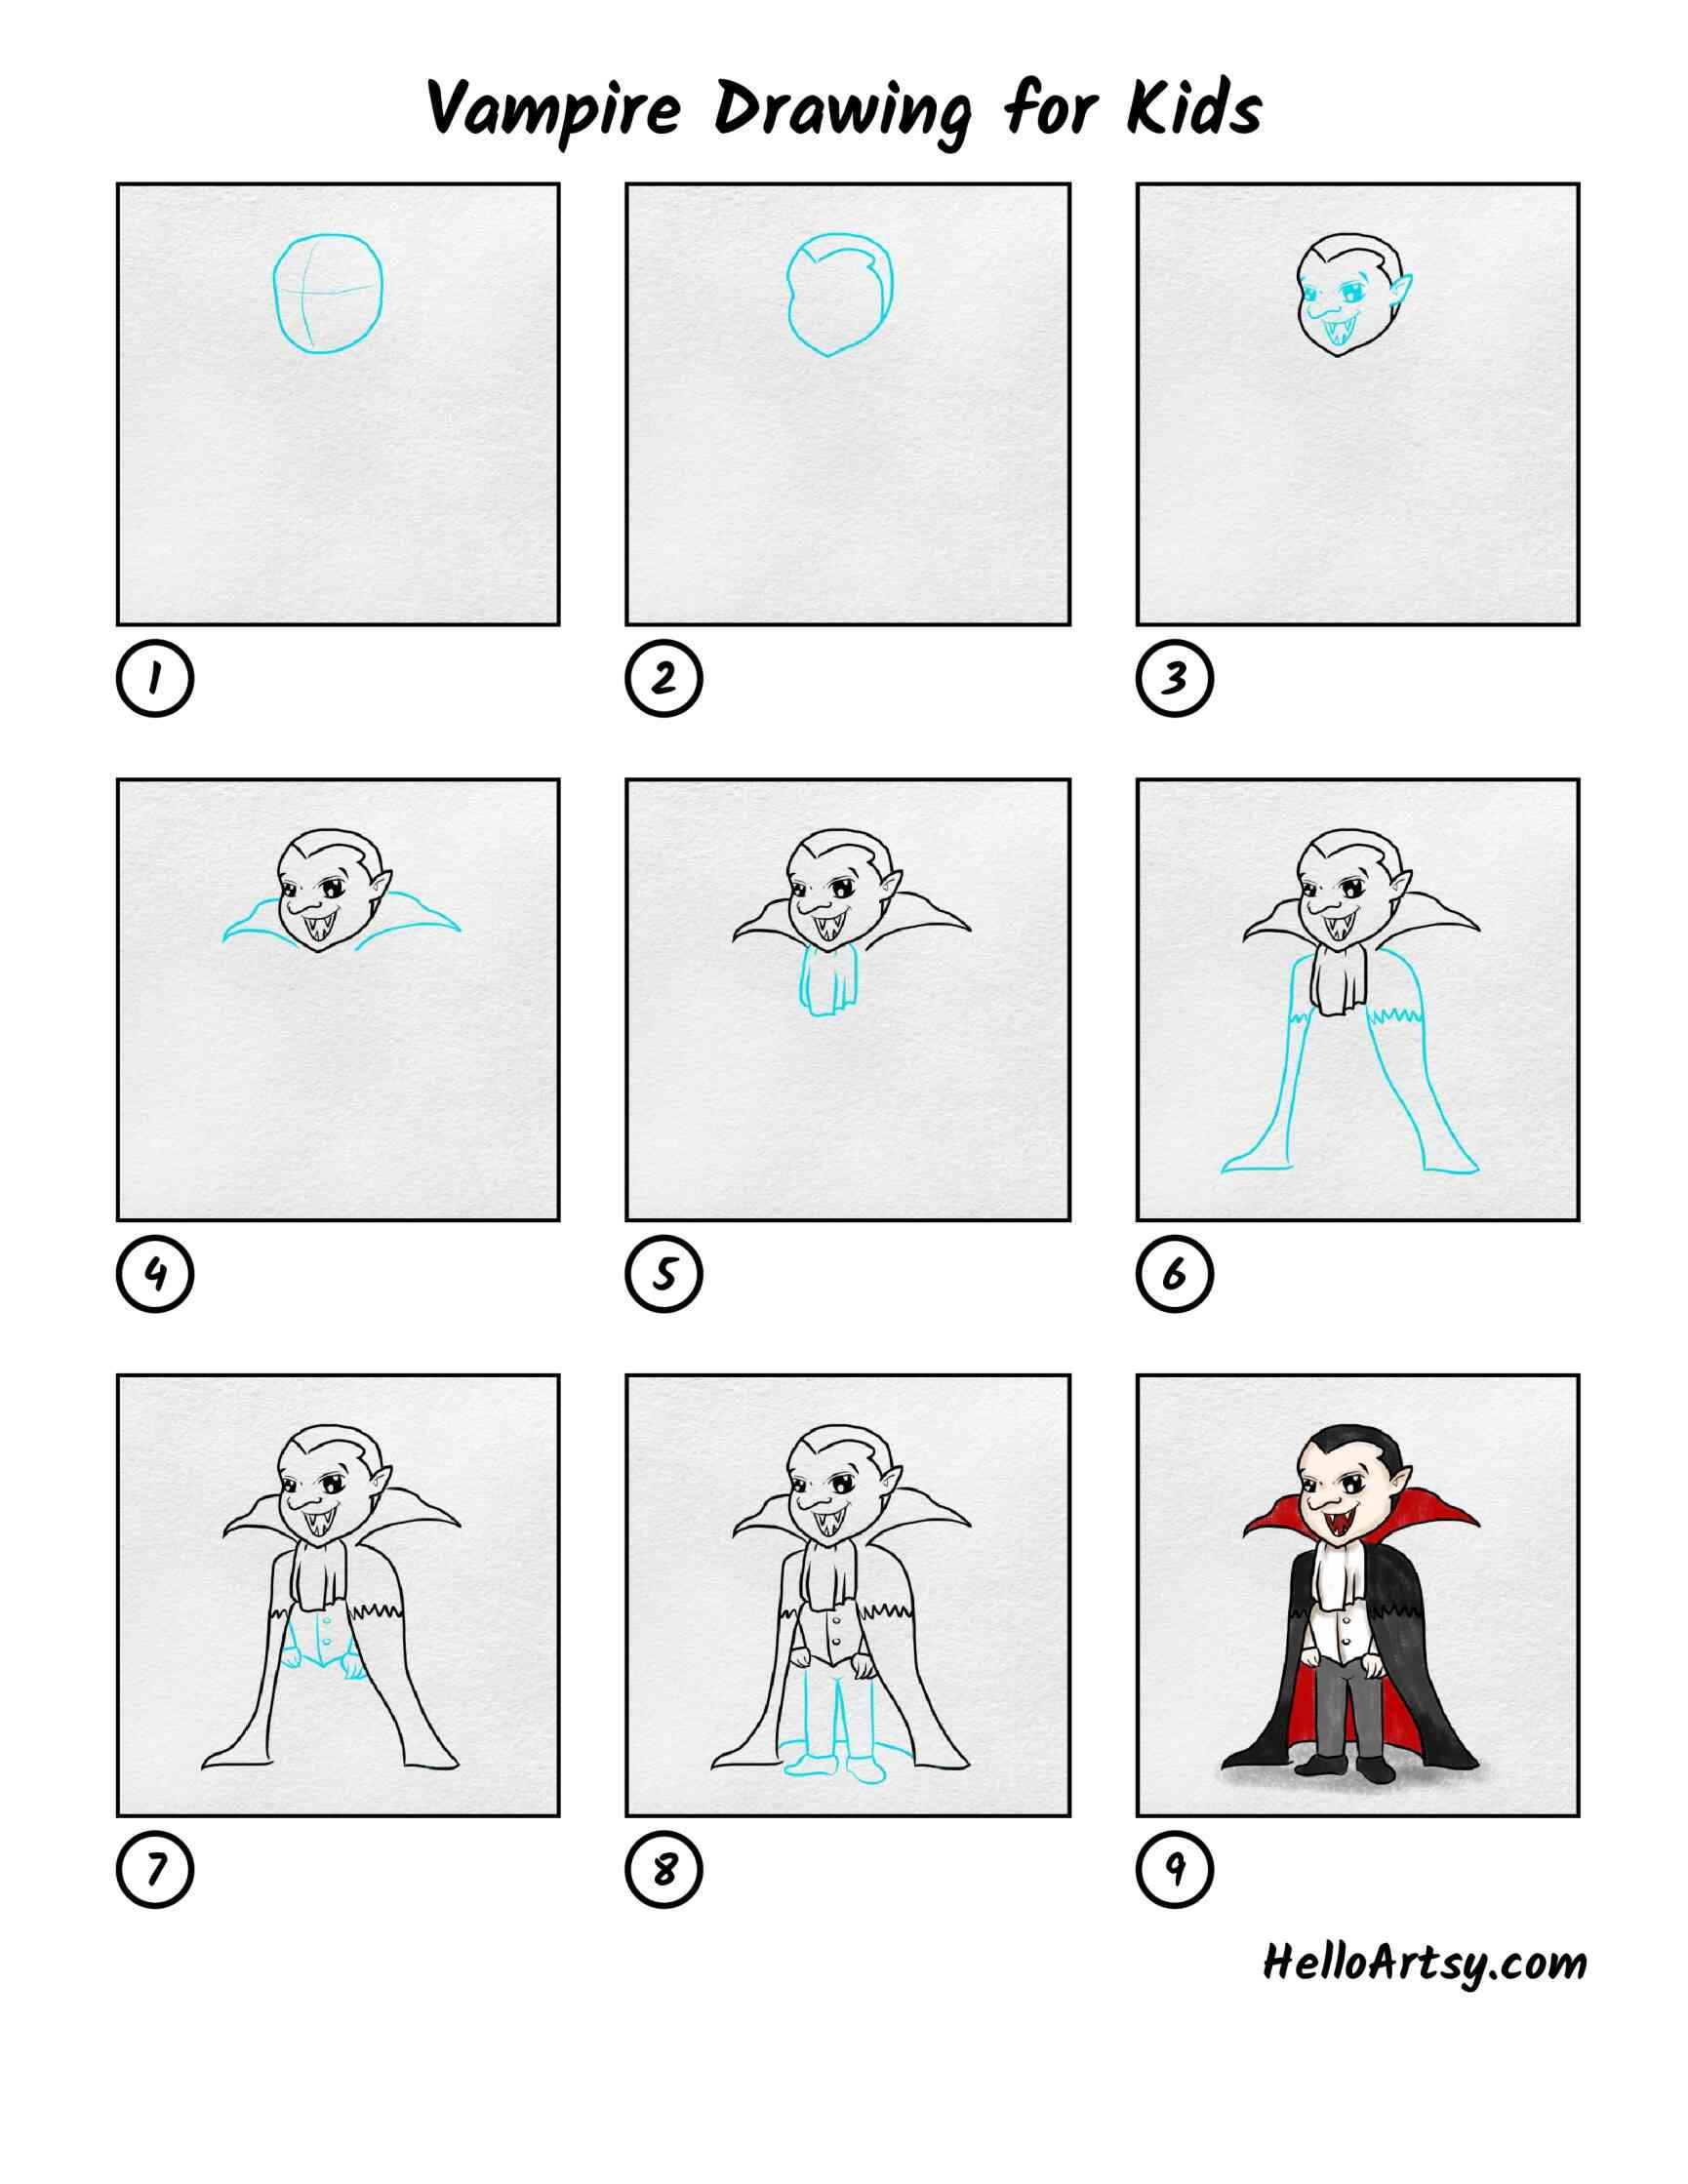 Vampire Drawing For Kids: All Steps